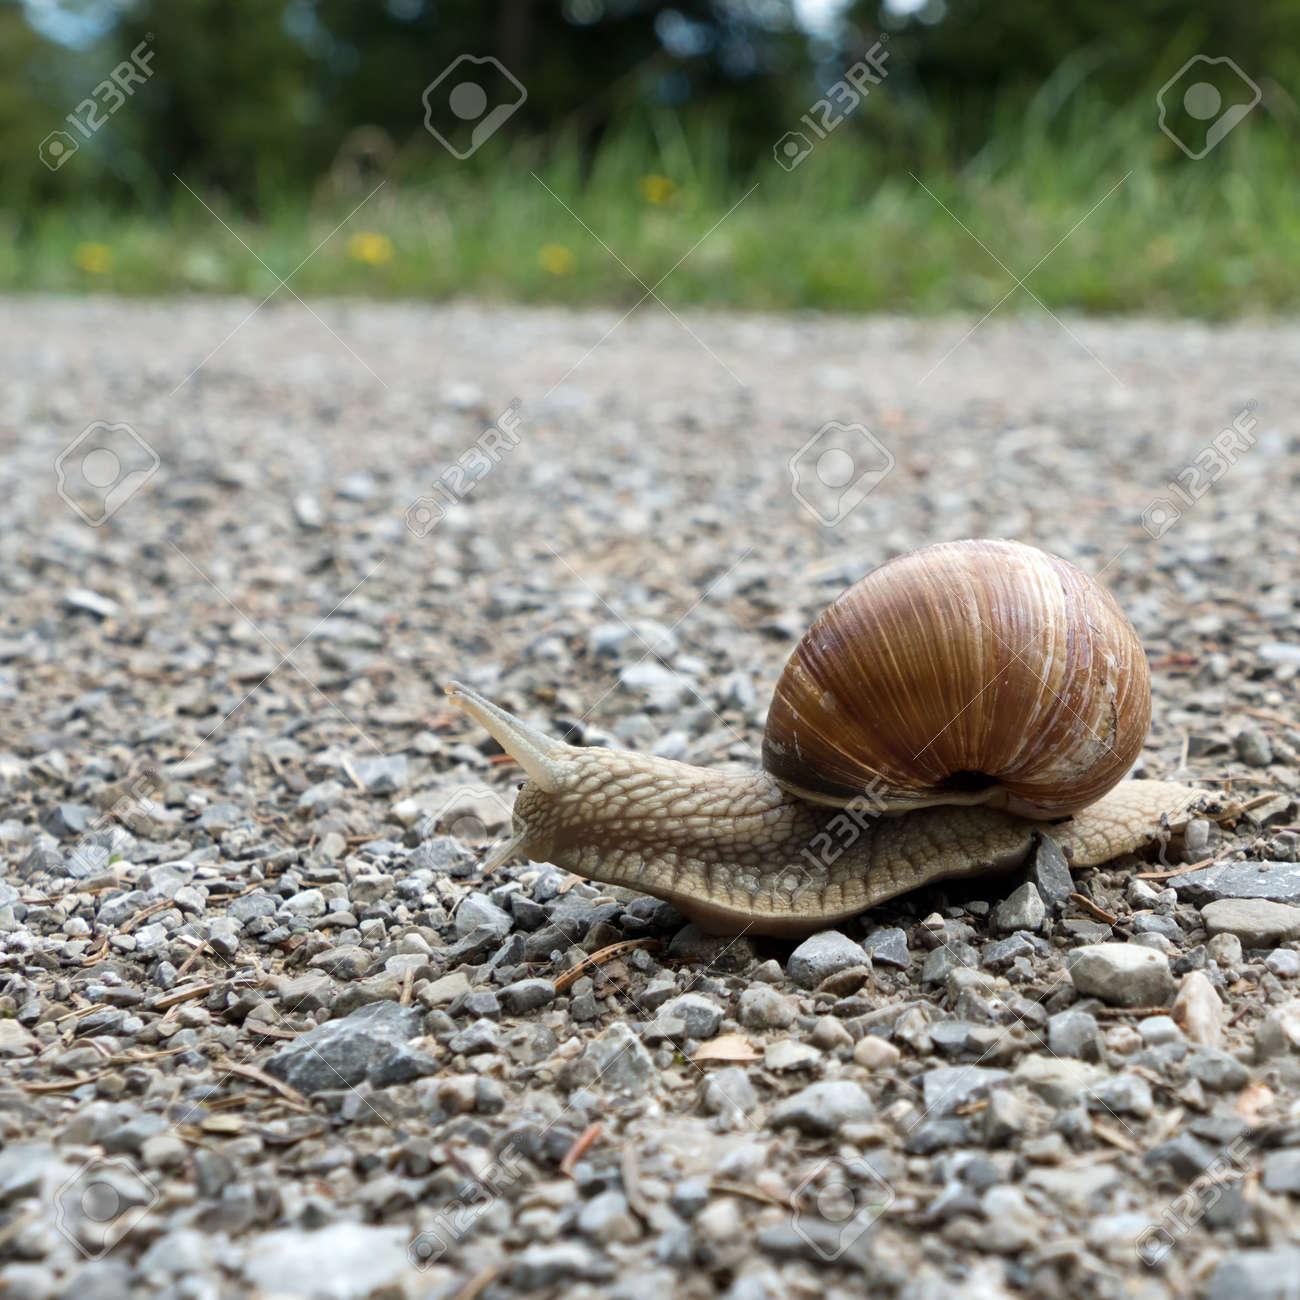 Close-up of an edible snail, helix pomatia - 156533157